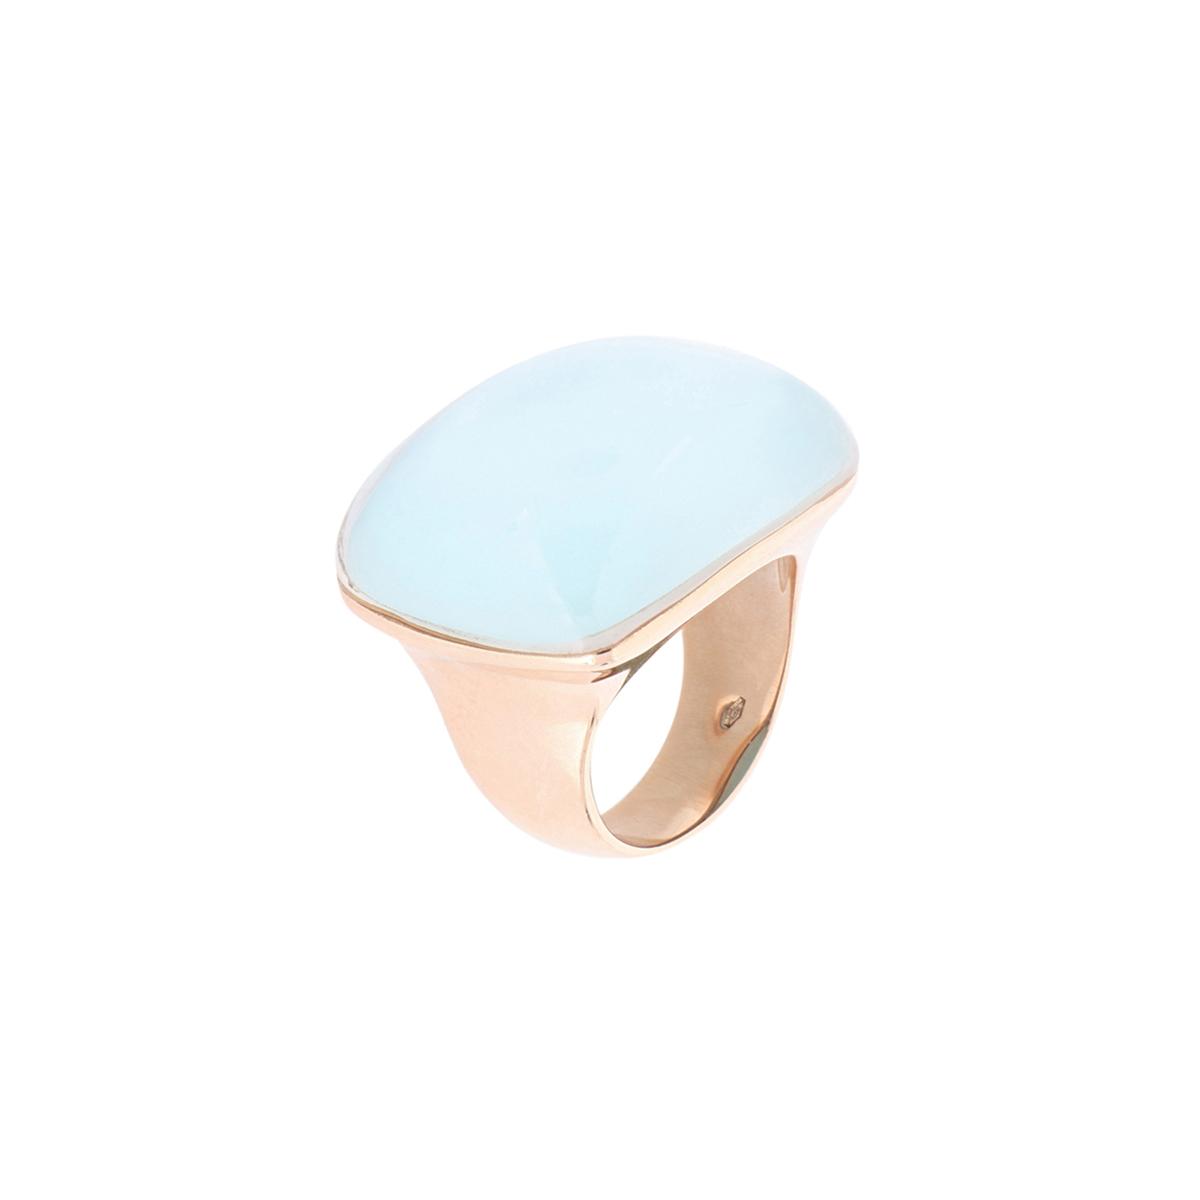 Cabochon Cut Turquoise Quartz Ring